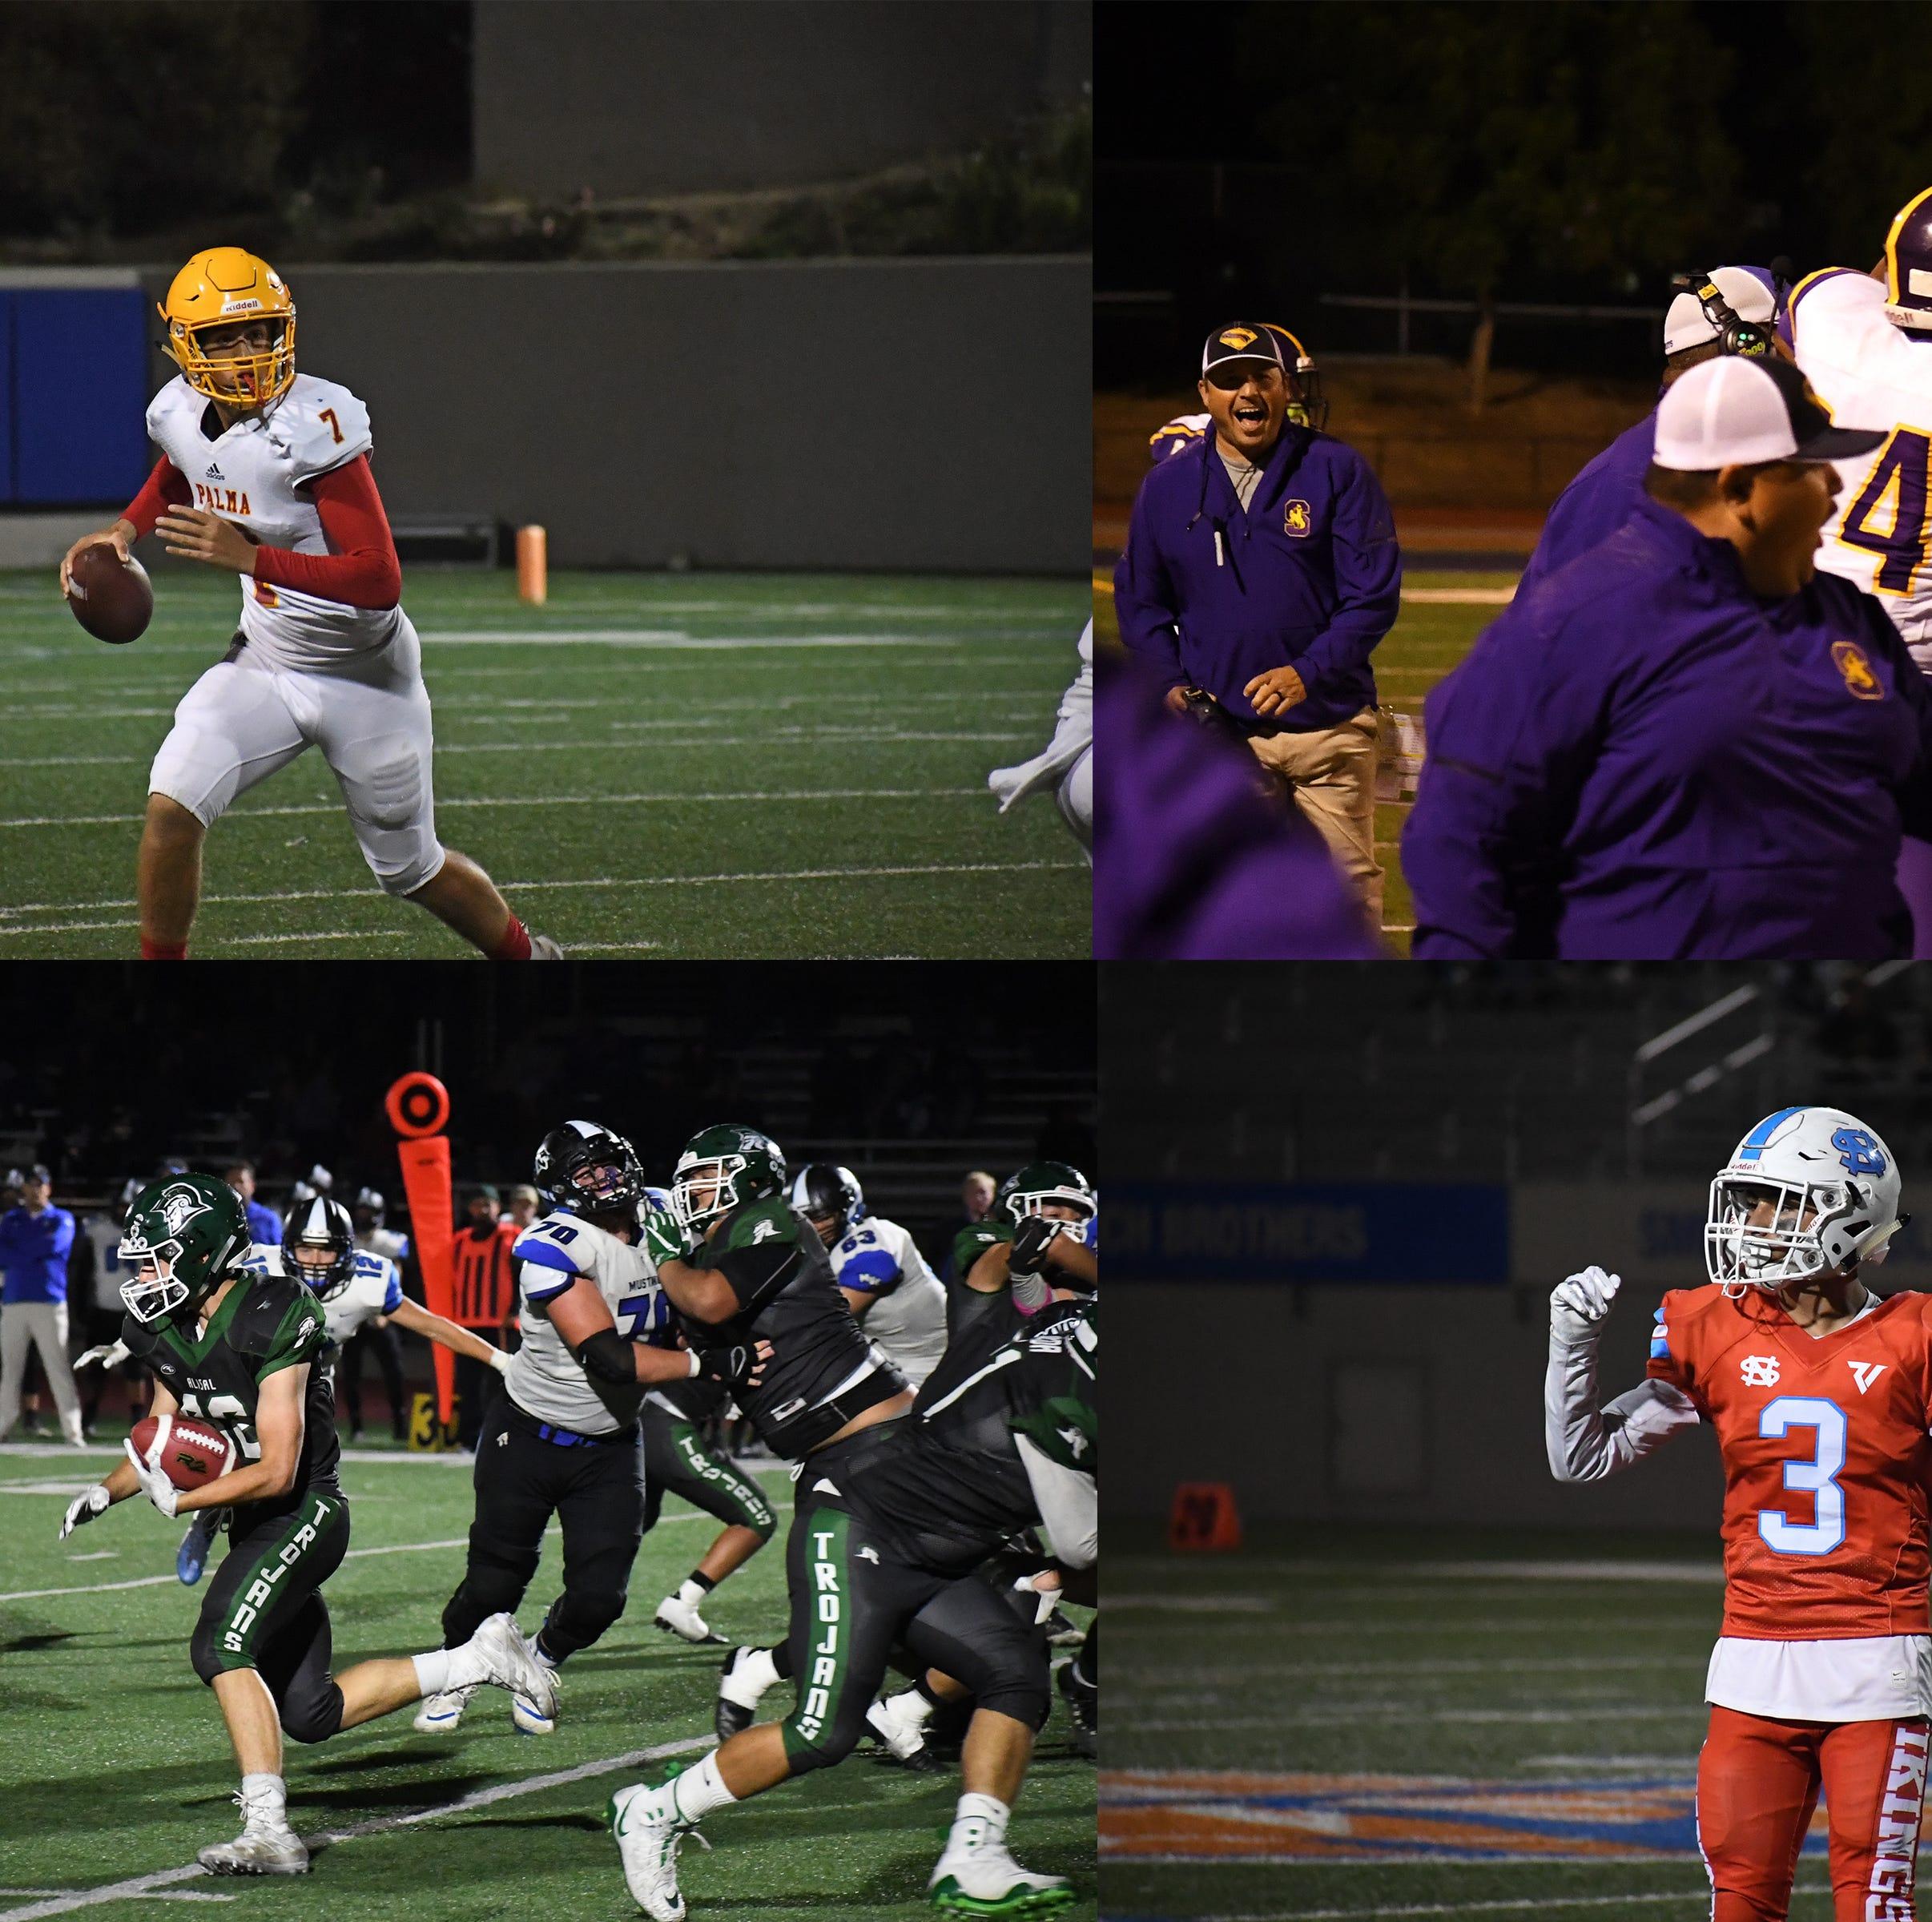 Here's your 2018 Salinas Californian All-Salinas Football Team